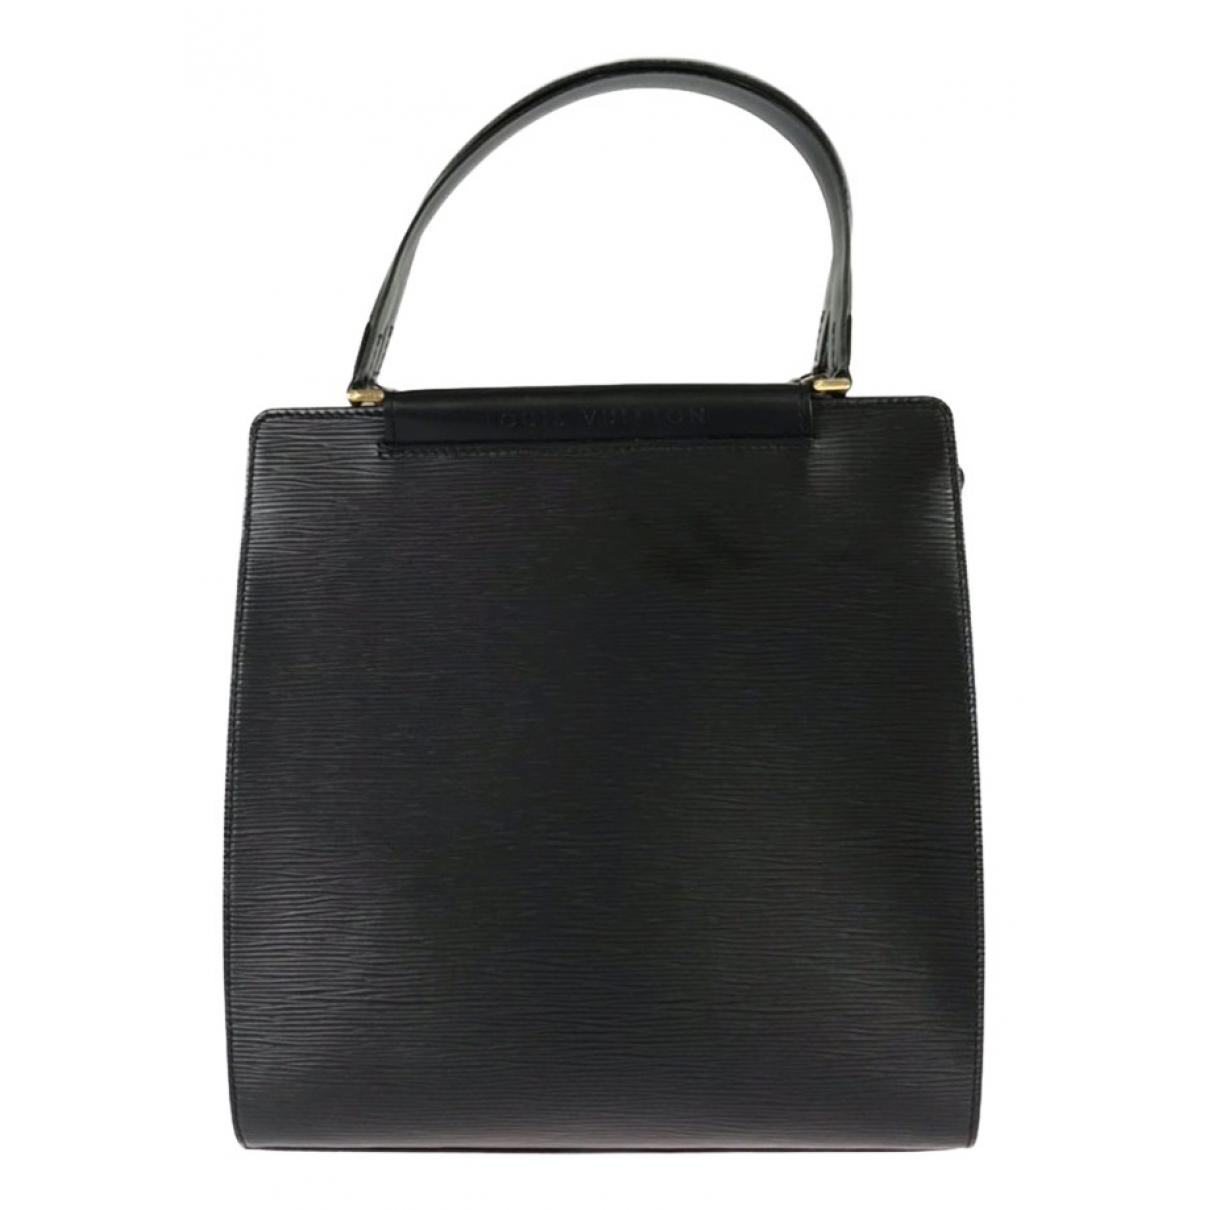 Louis Vuitton Figheri Black Leather handbag for Women N